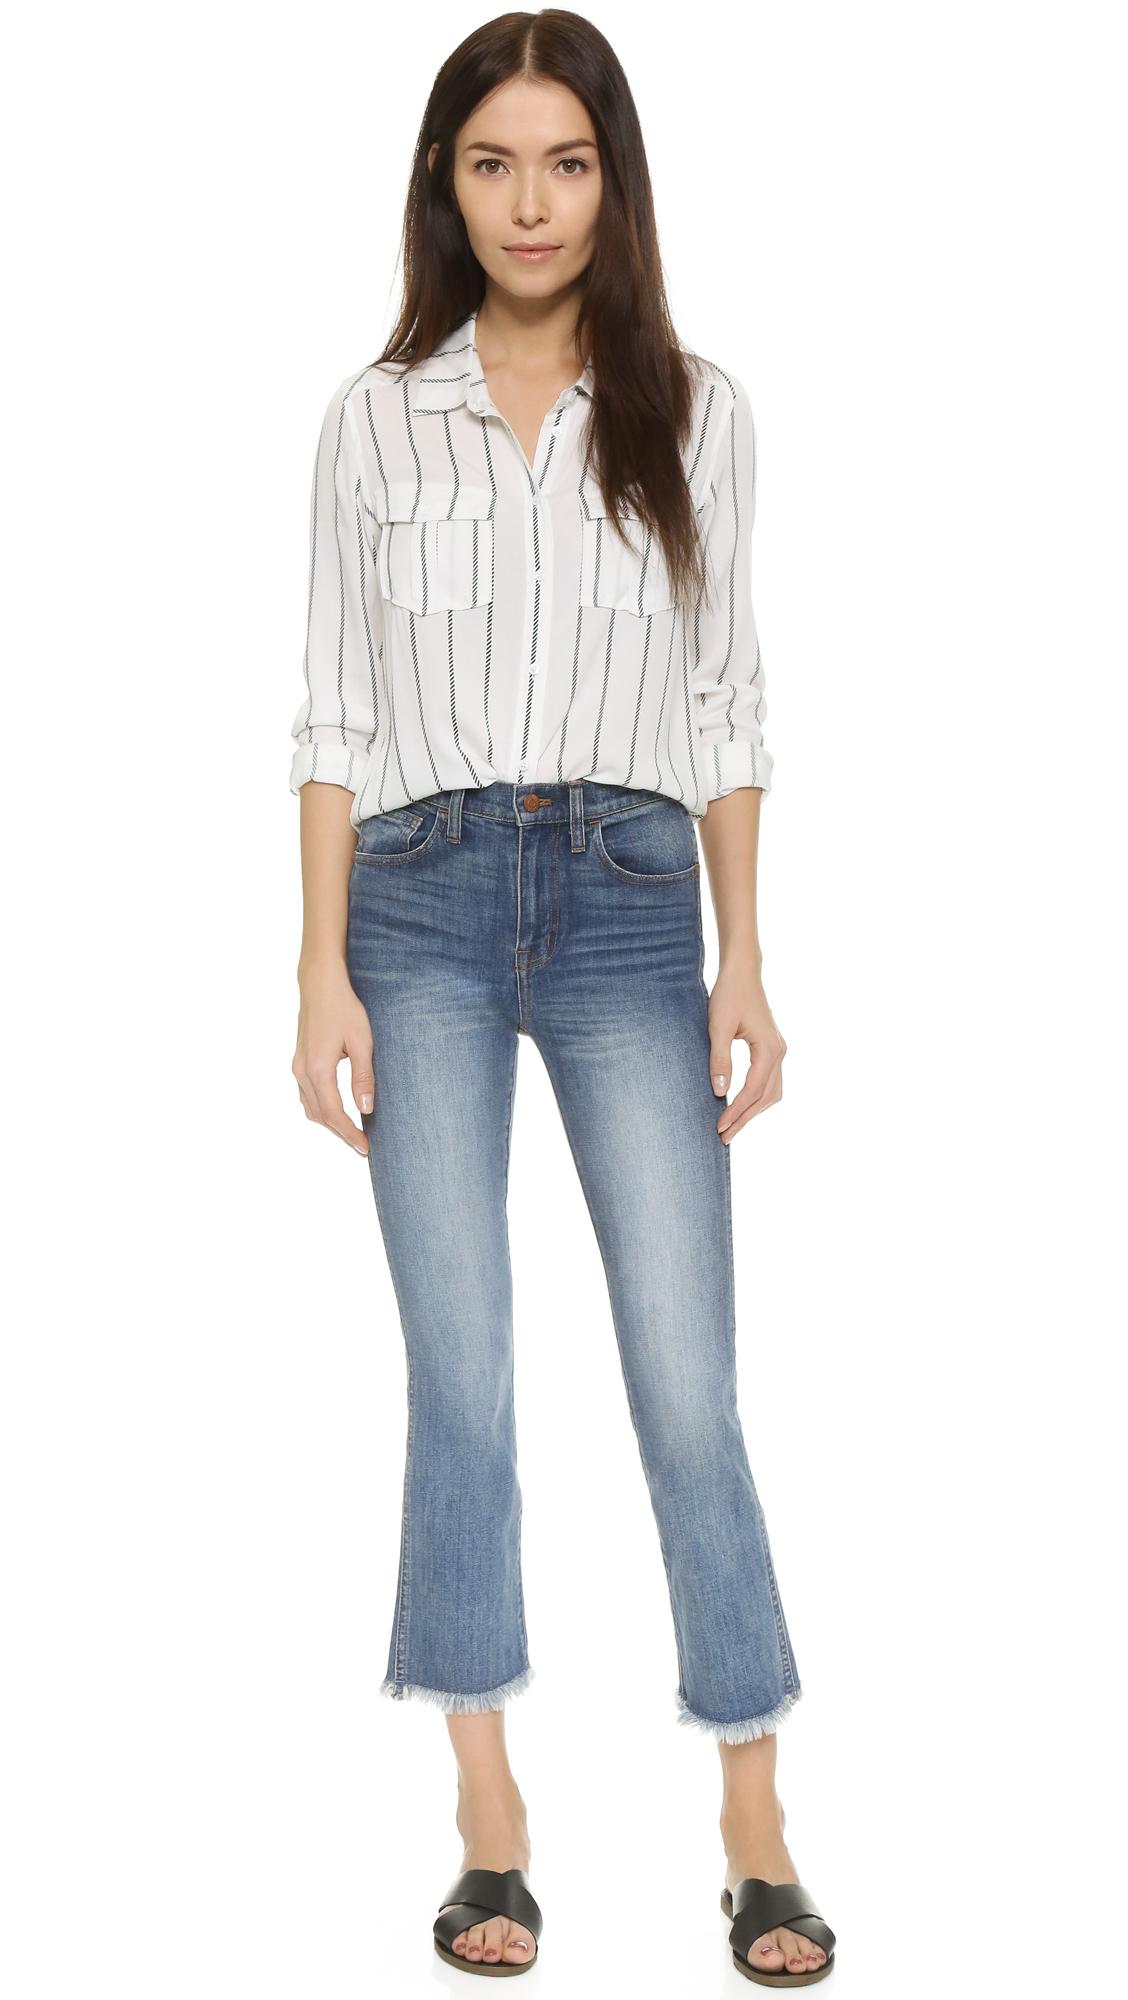 Madewell Demi Boot Raw Hem Jeans in Blue